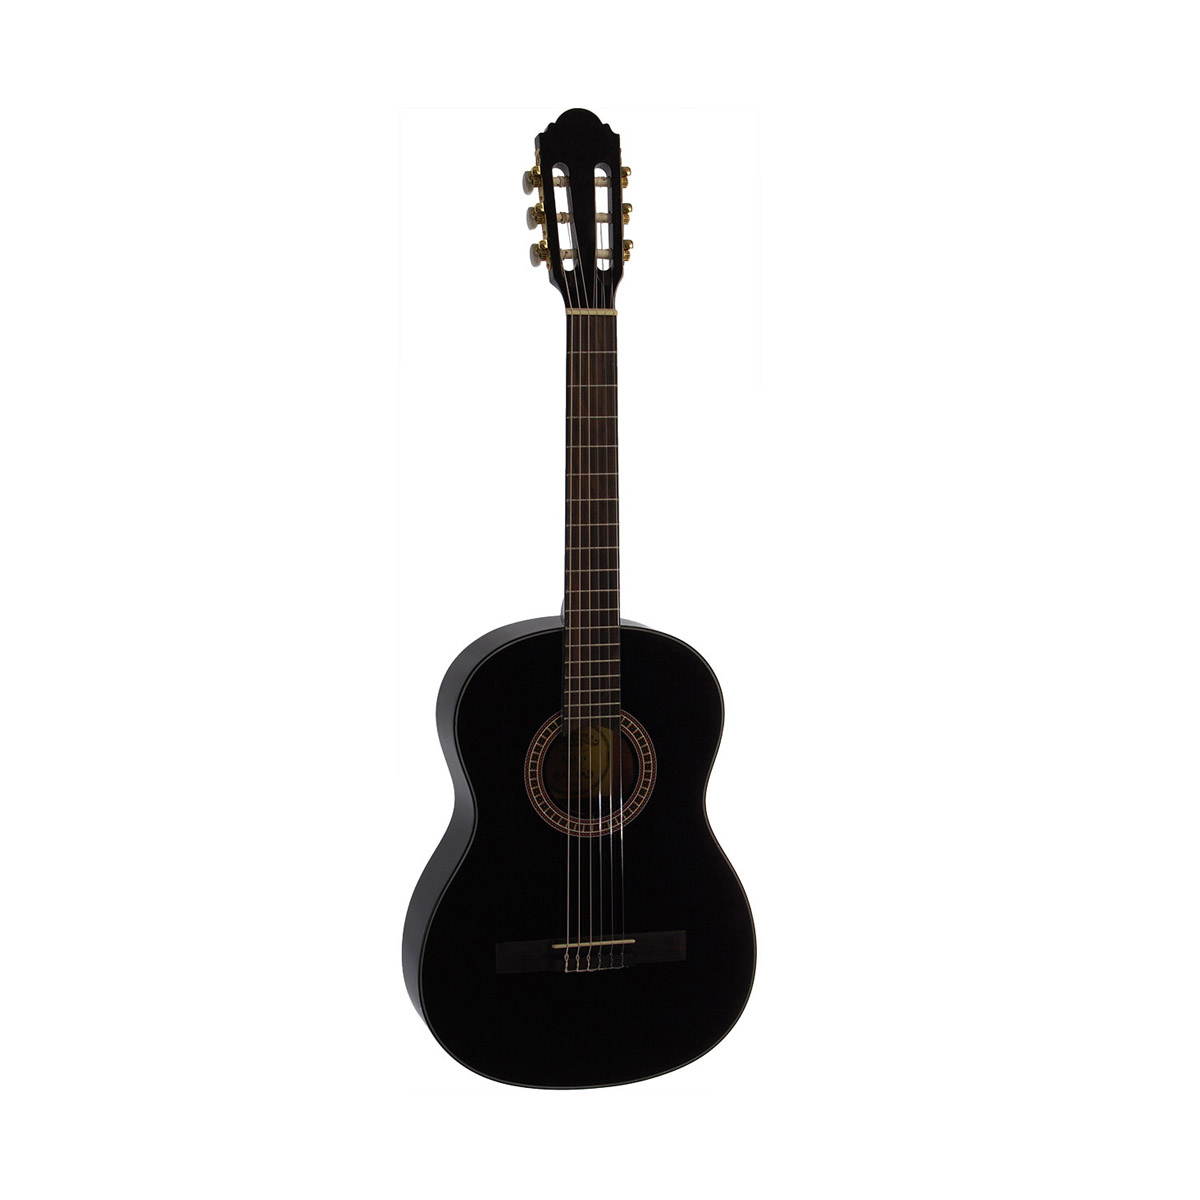 Santana B7 BK v2 børne spansk-guitar sort